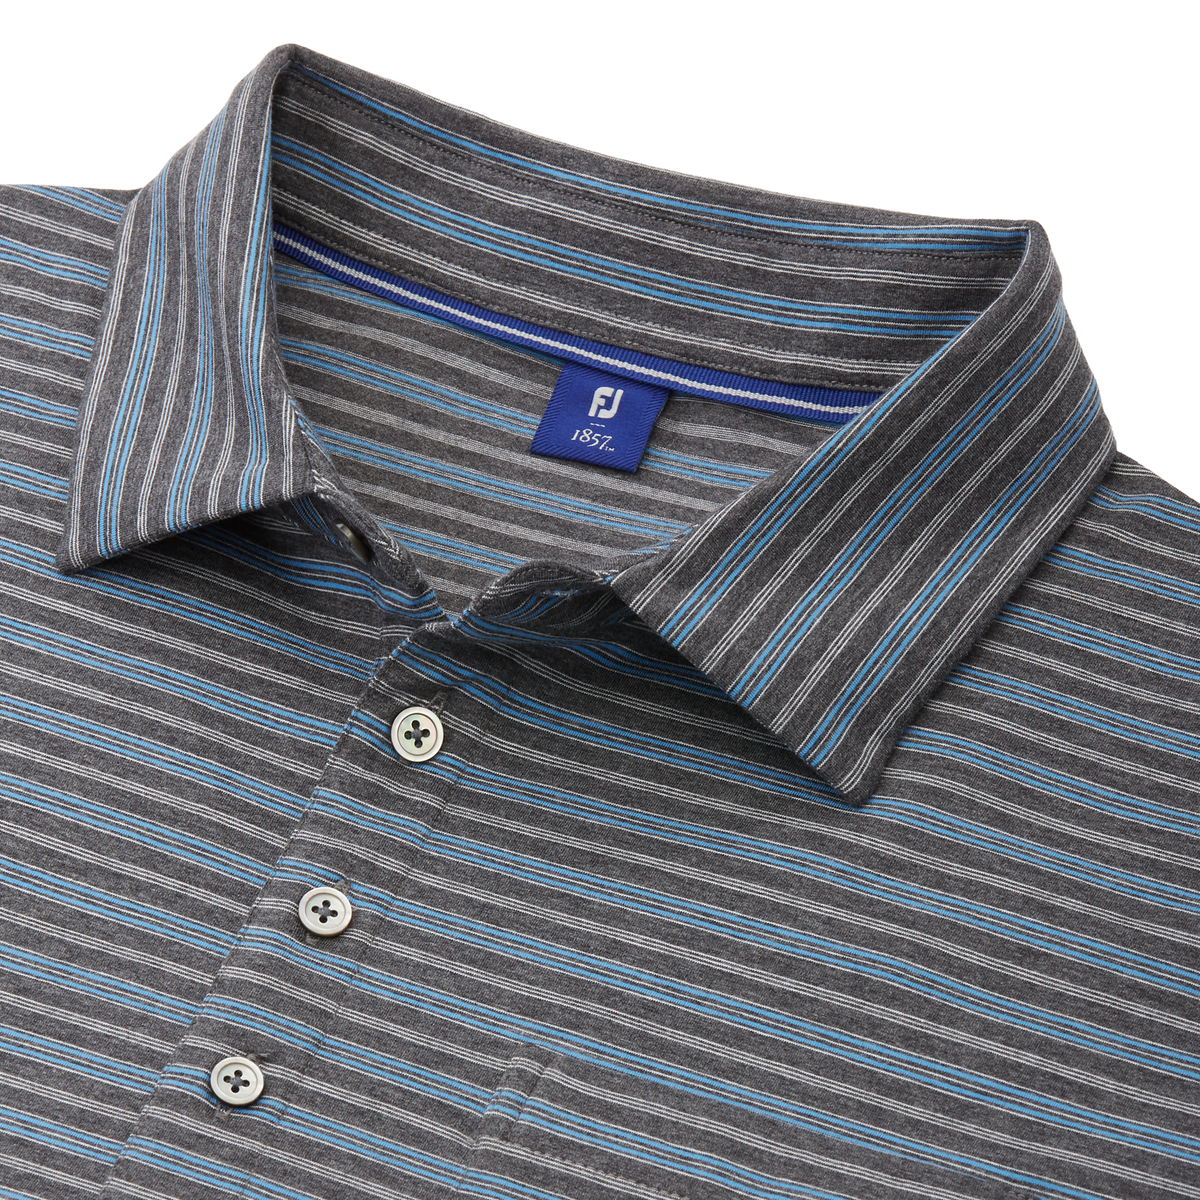 Lisle Vintage Stripe with Pocket Shirt